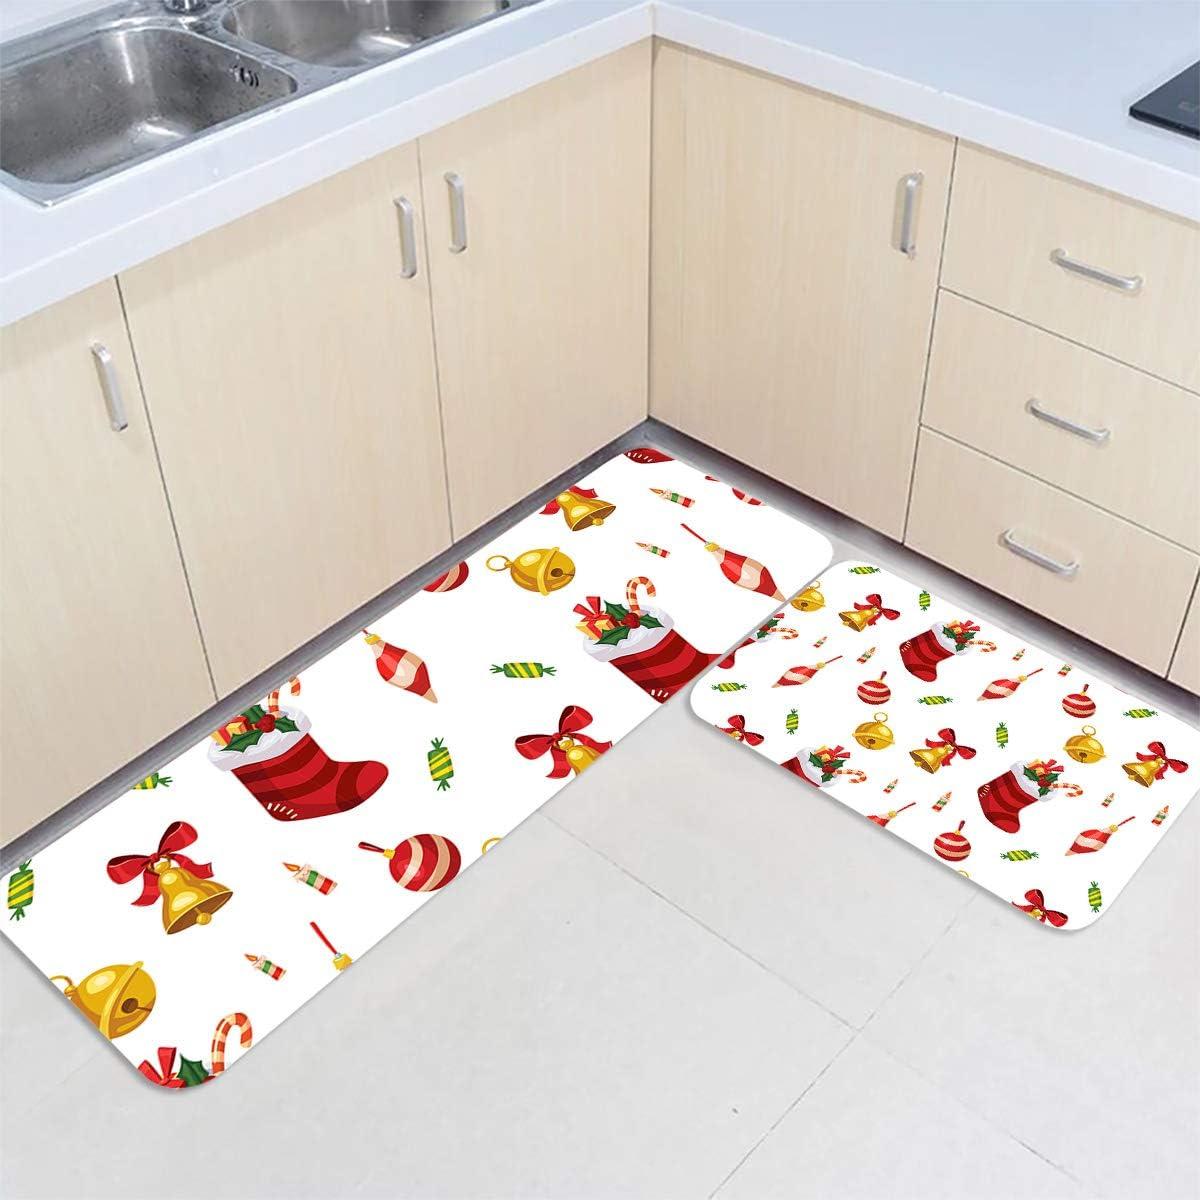 IDOWMAT Kitchen Mat Set of Don't miss the campaign Premium Floor 2 Non-Slip Max 50% OFF